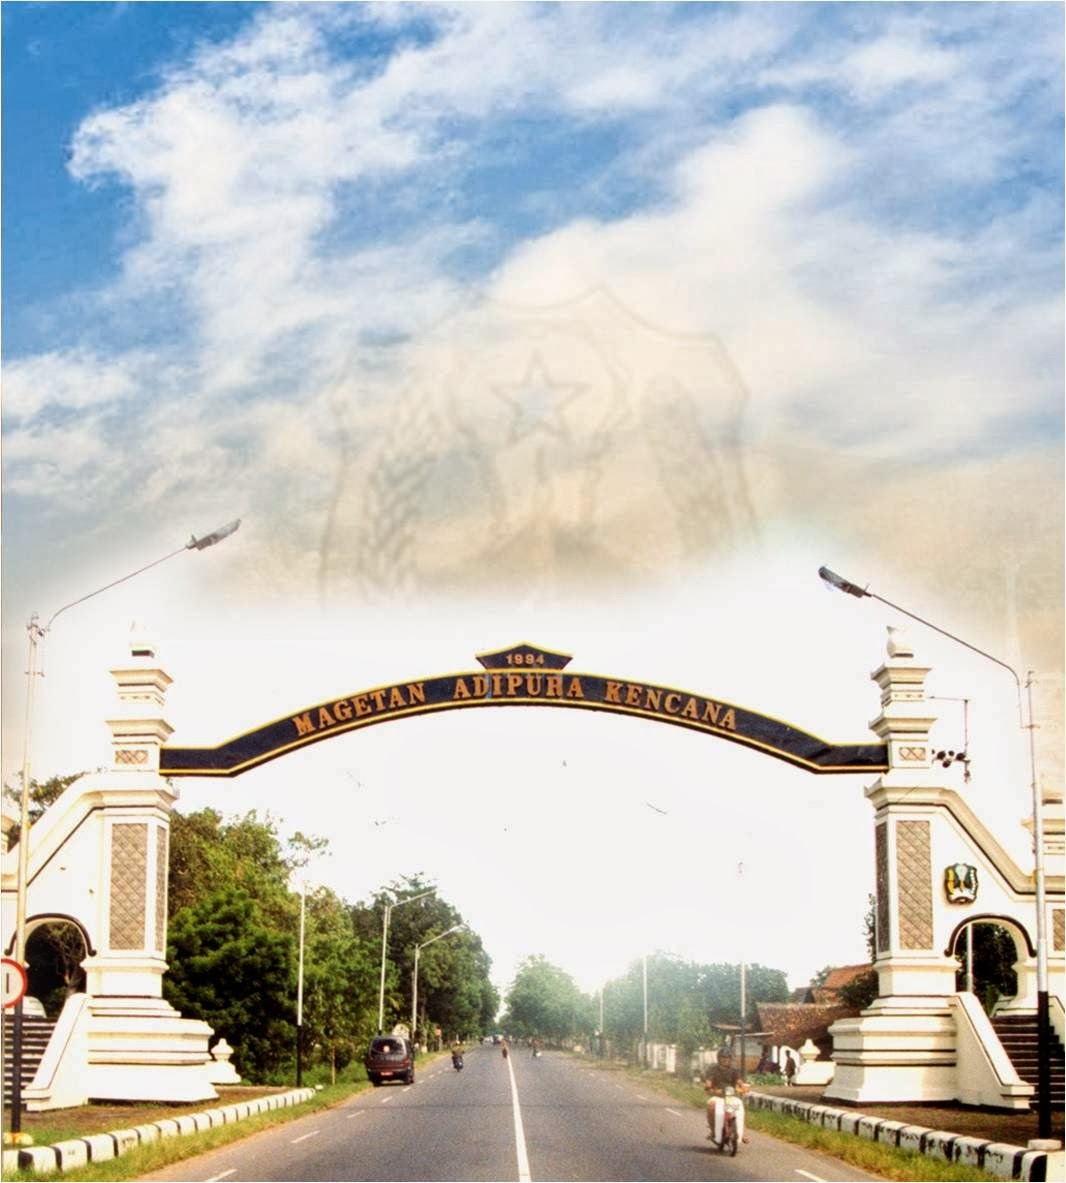 Potensi Wisata Alam Kabupaten Magetan Daviq Nuansa Taman Ria Maospati